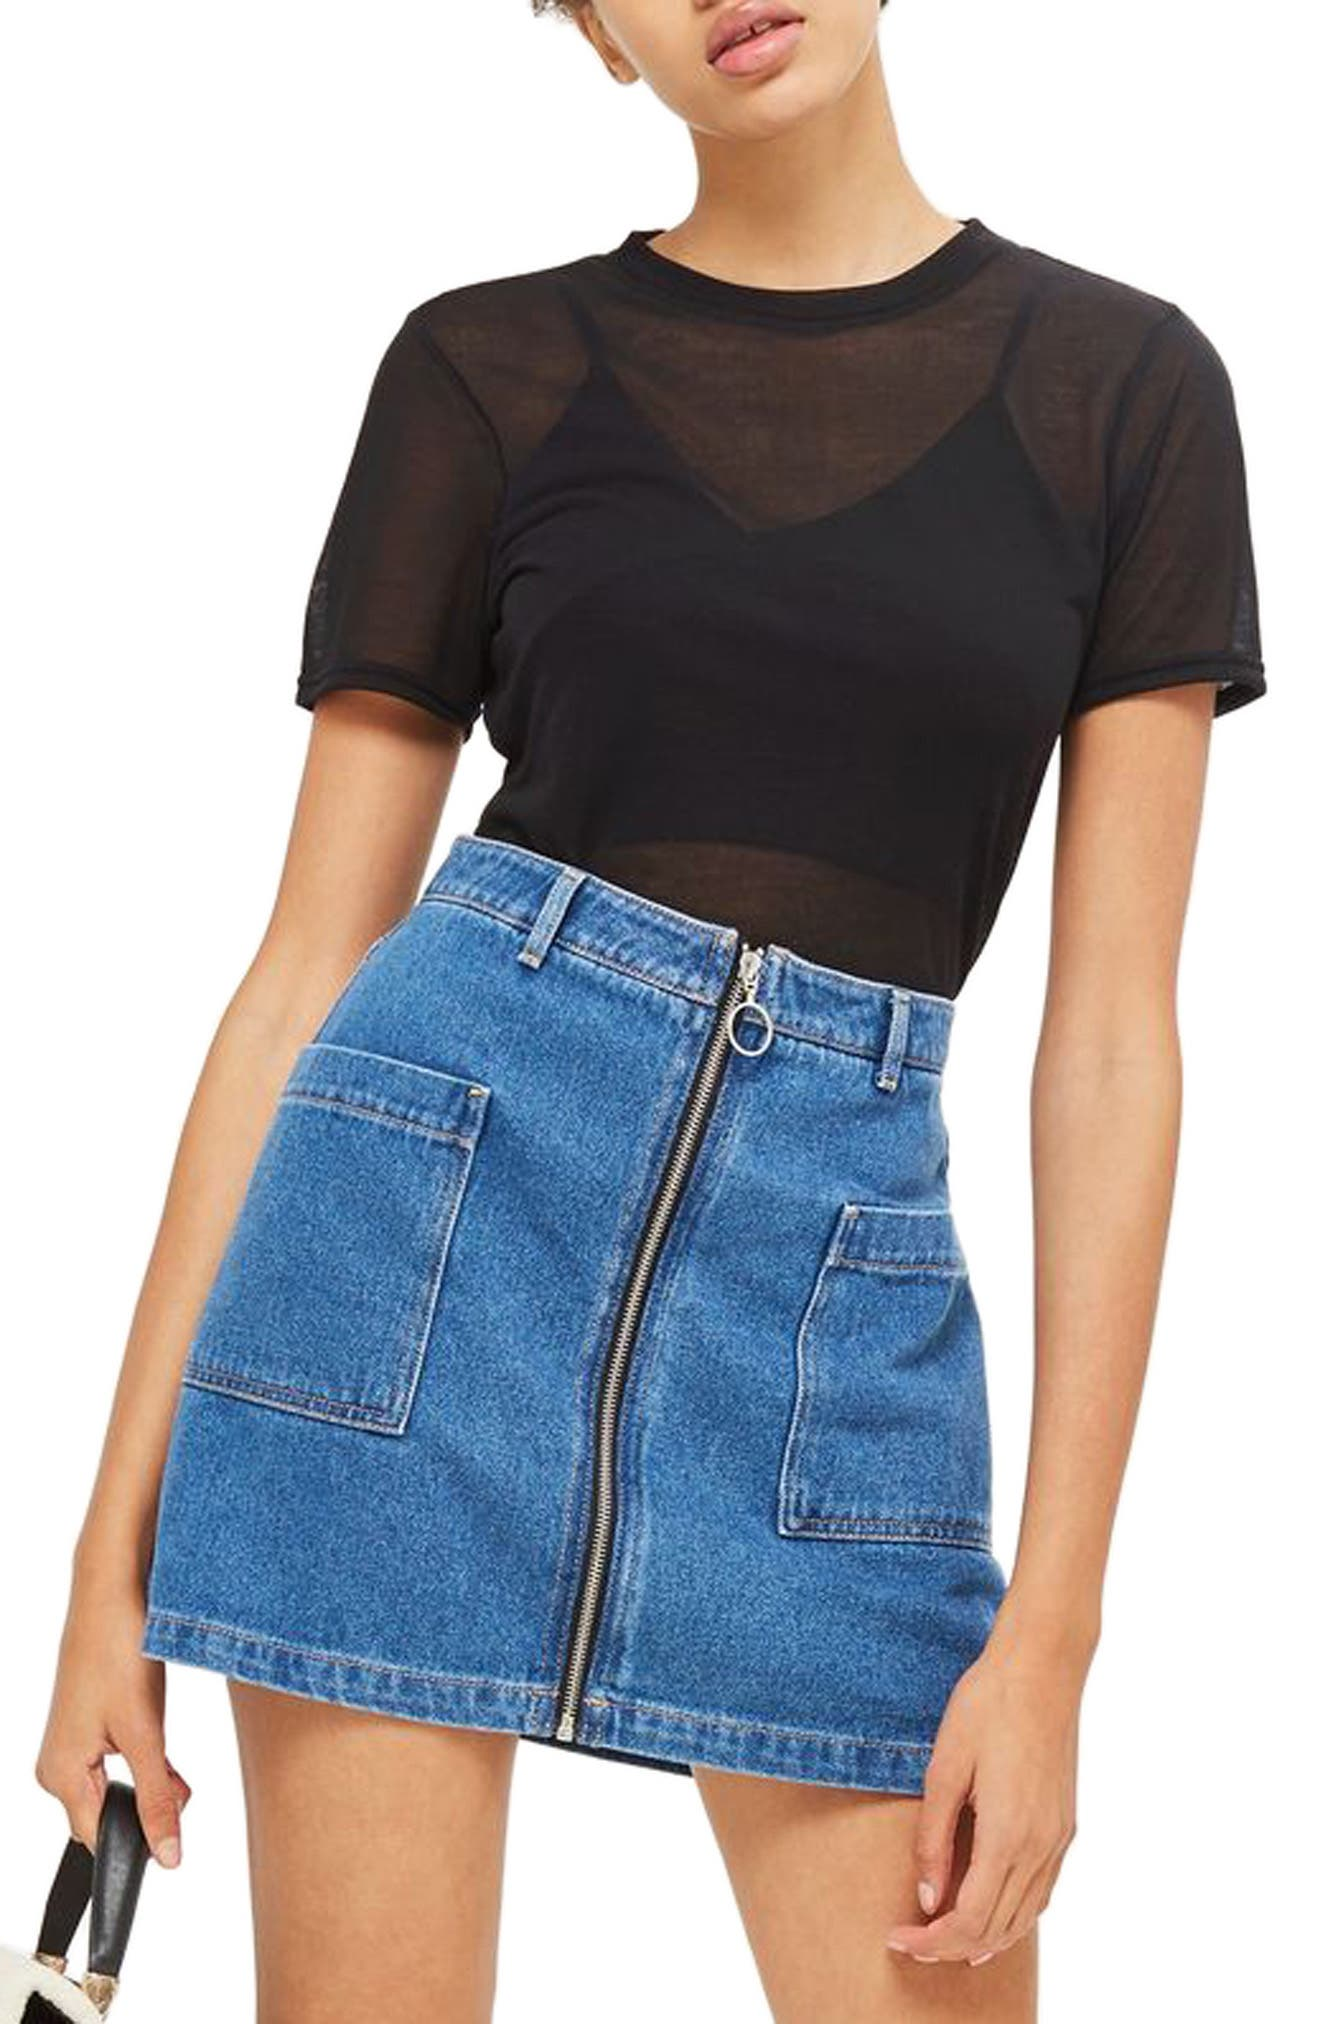 Sheer T-Shirt Bodysuit,                             Main thumbnail 1, color,                             001